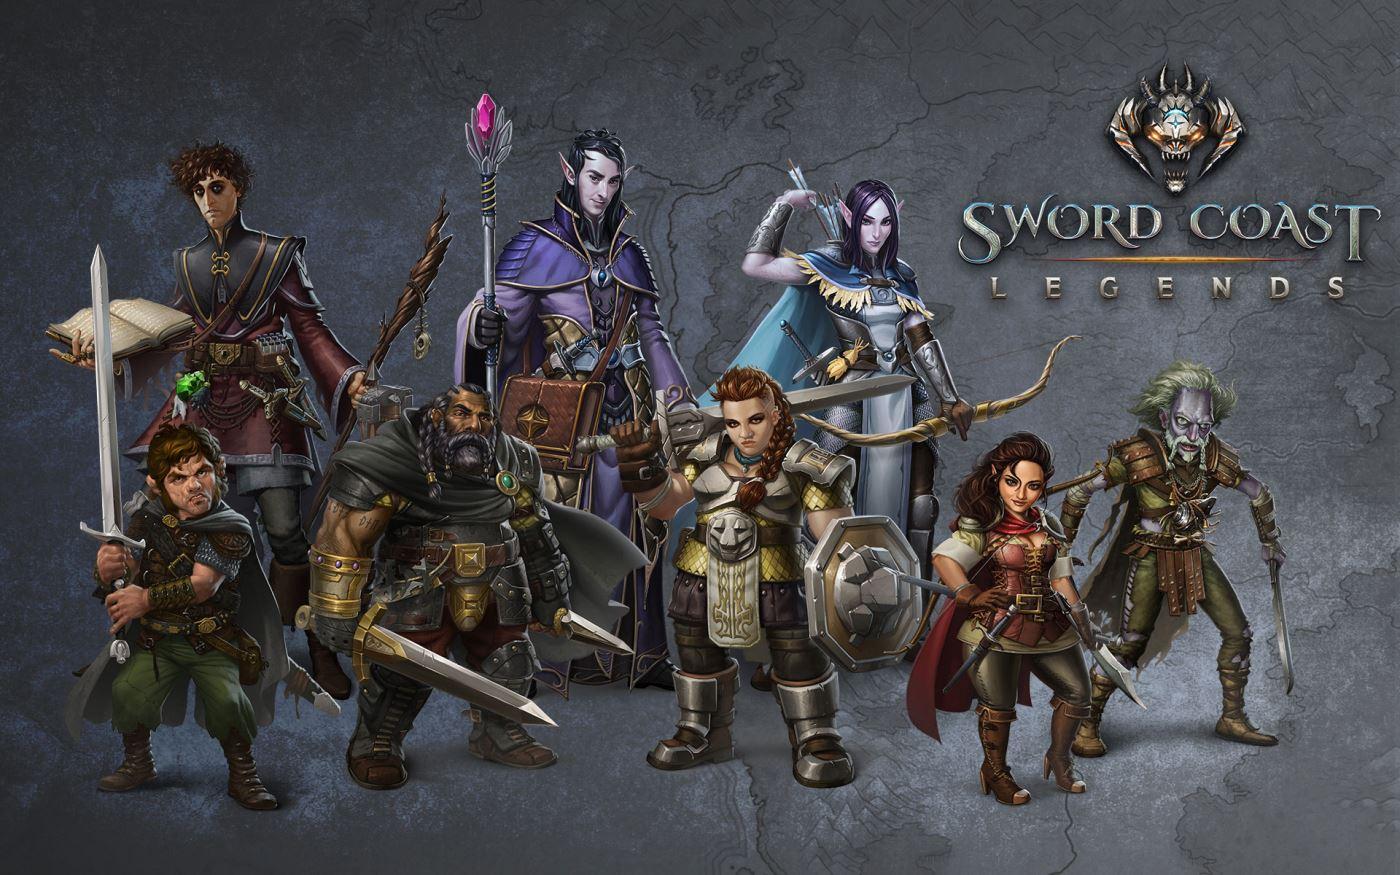 Sword Coast Legends zum zweiten Mal verschoben